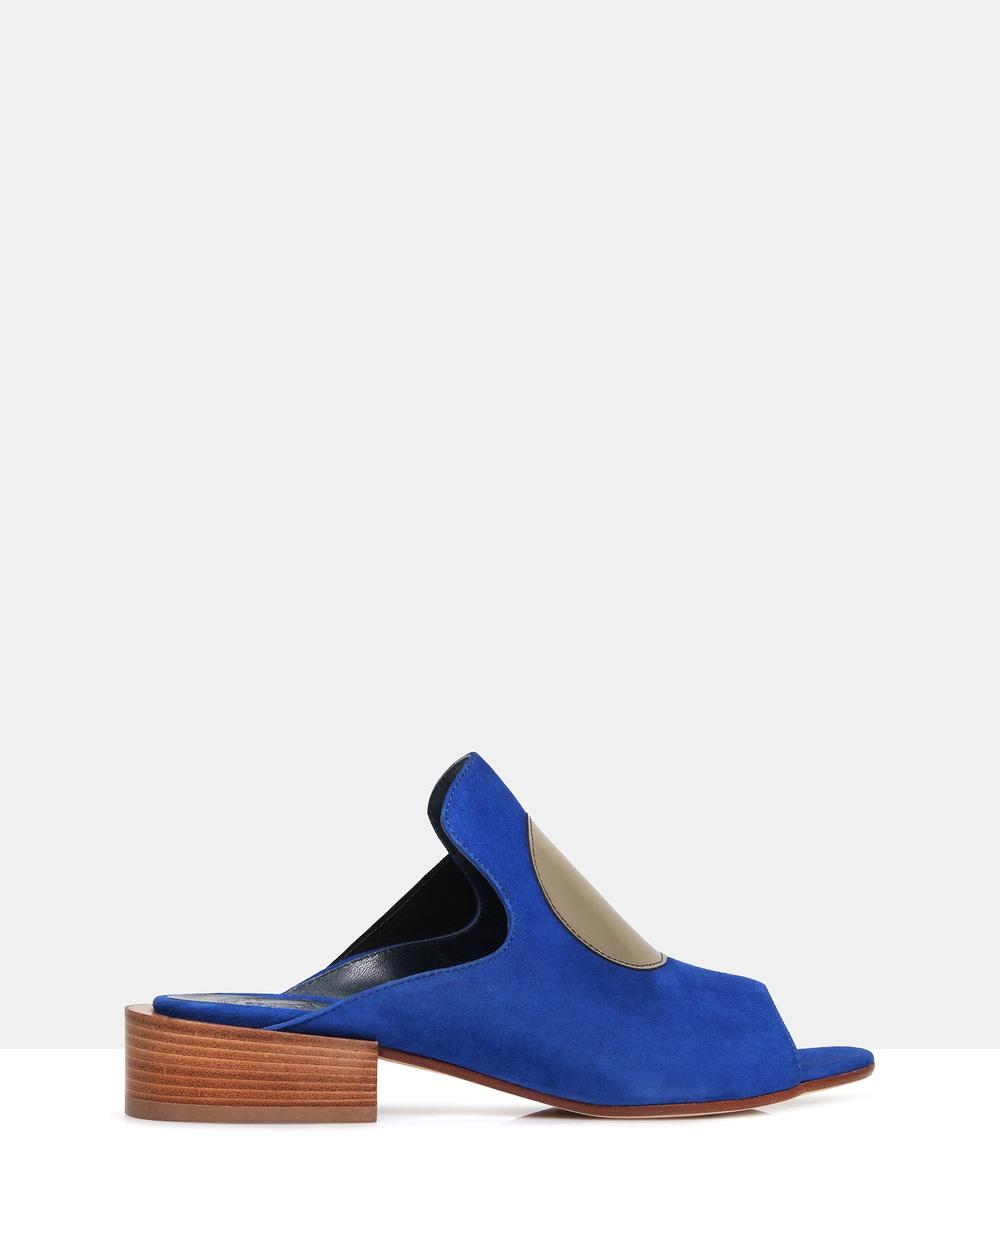 Beau Coops Valerie Open Toe Mule Mid-low heels Blue Valerie Open Toe Mule